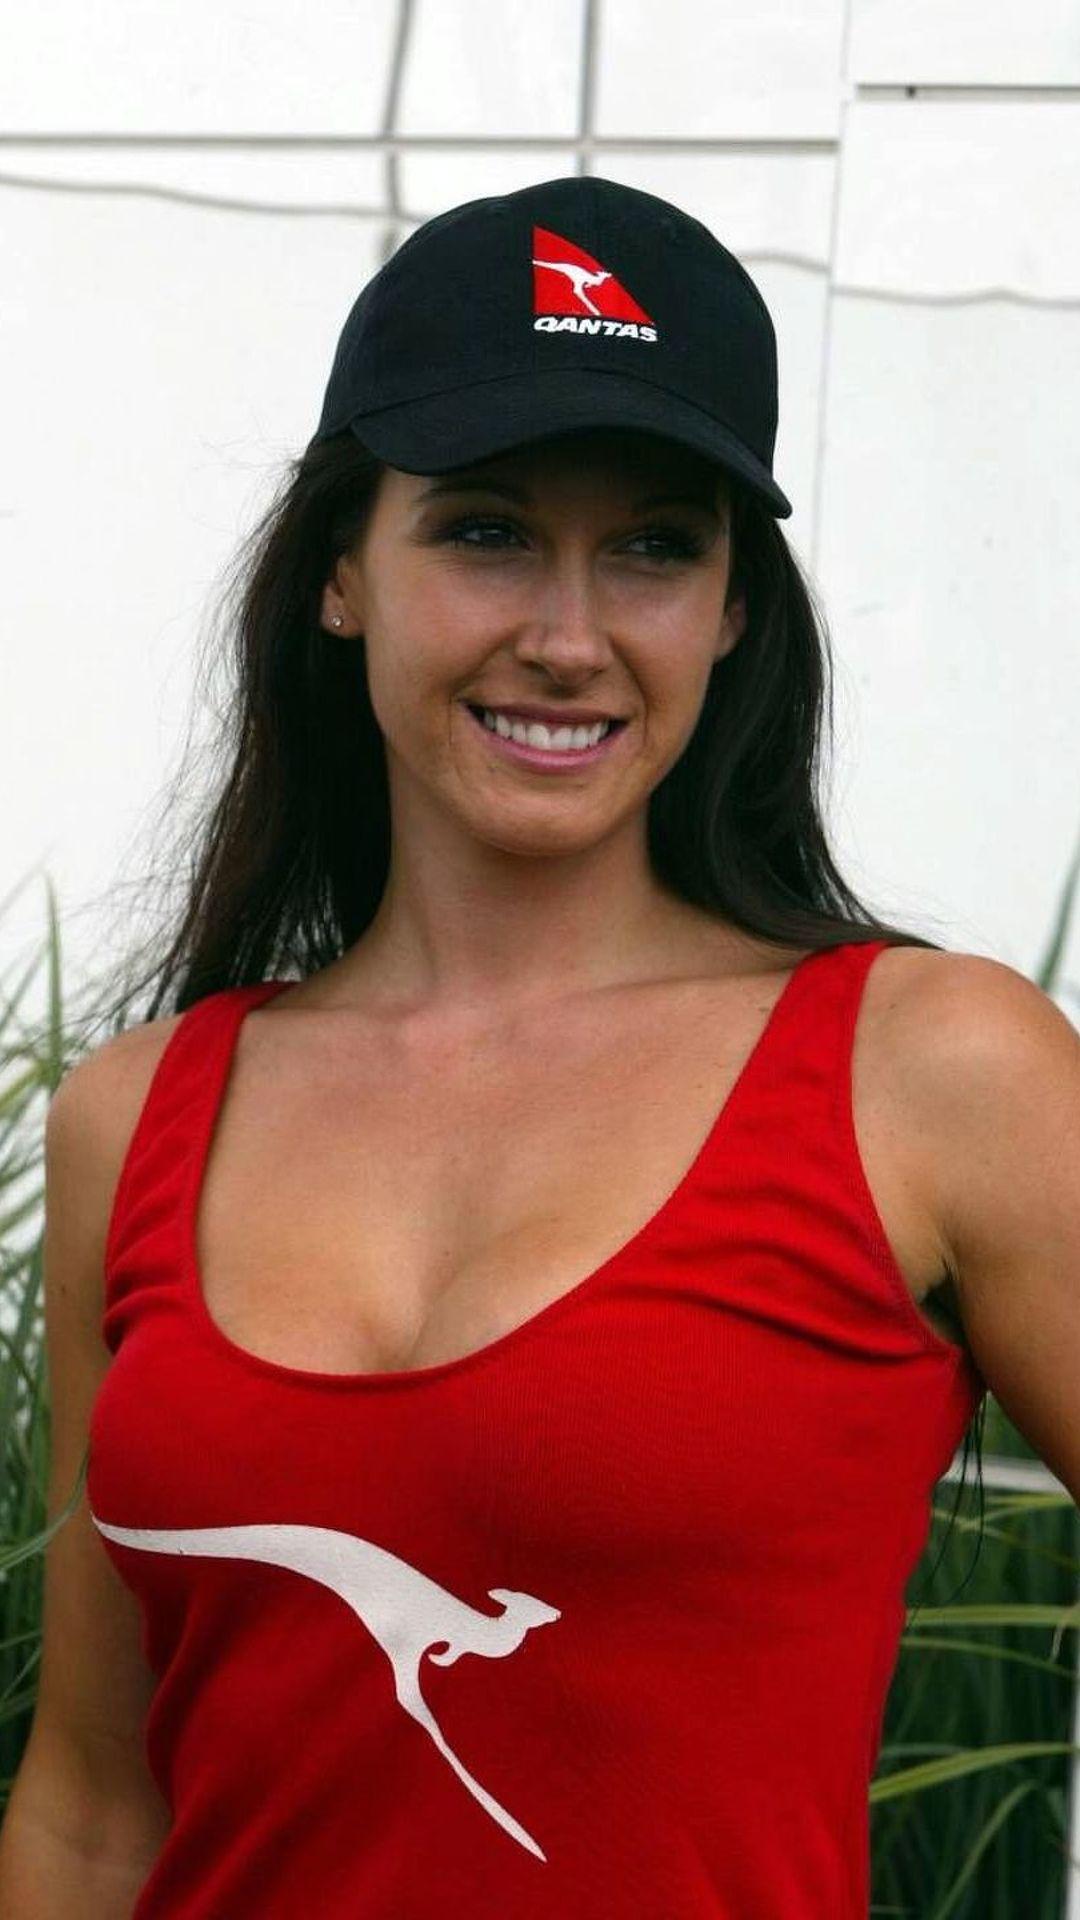 uk.icdn.ru girl Airline Qantas to title sponsor Australian GP product 2010-02-24 22:41:20